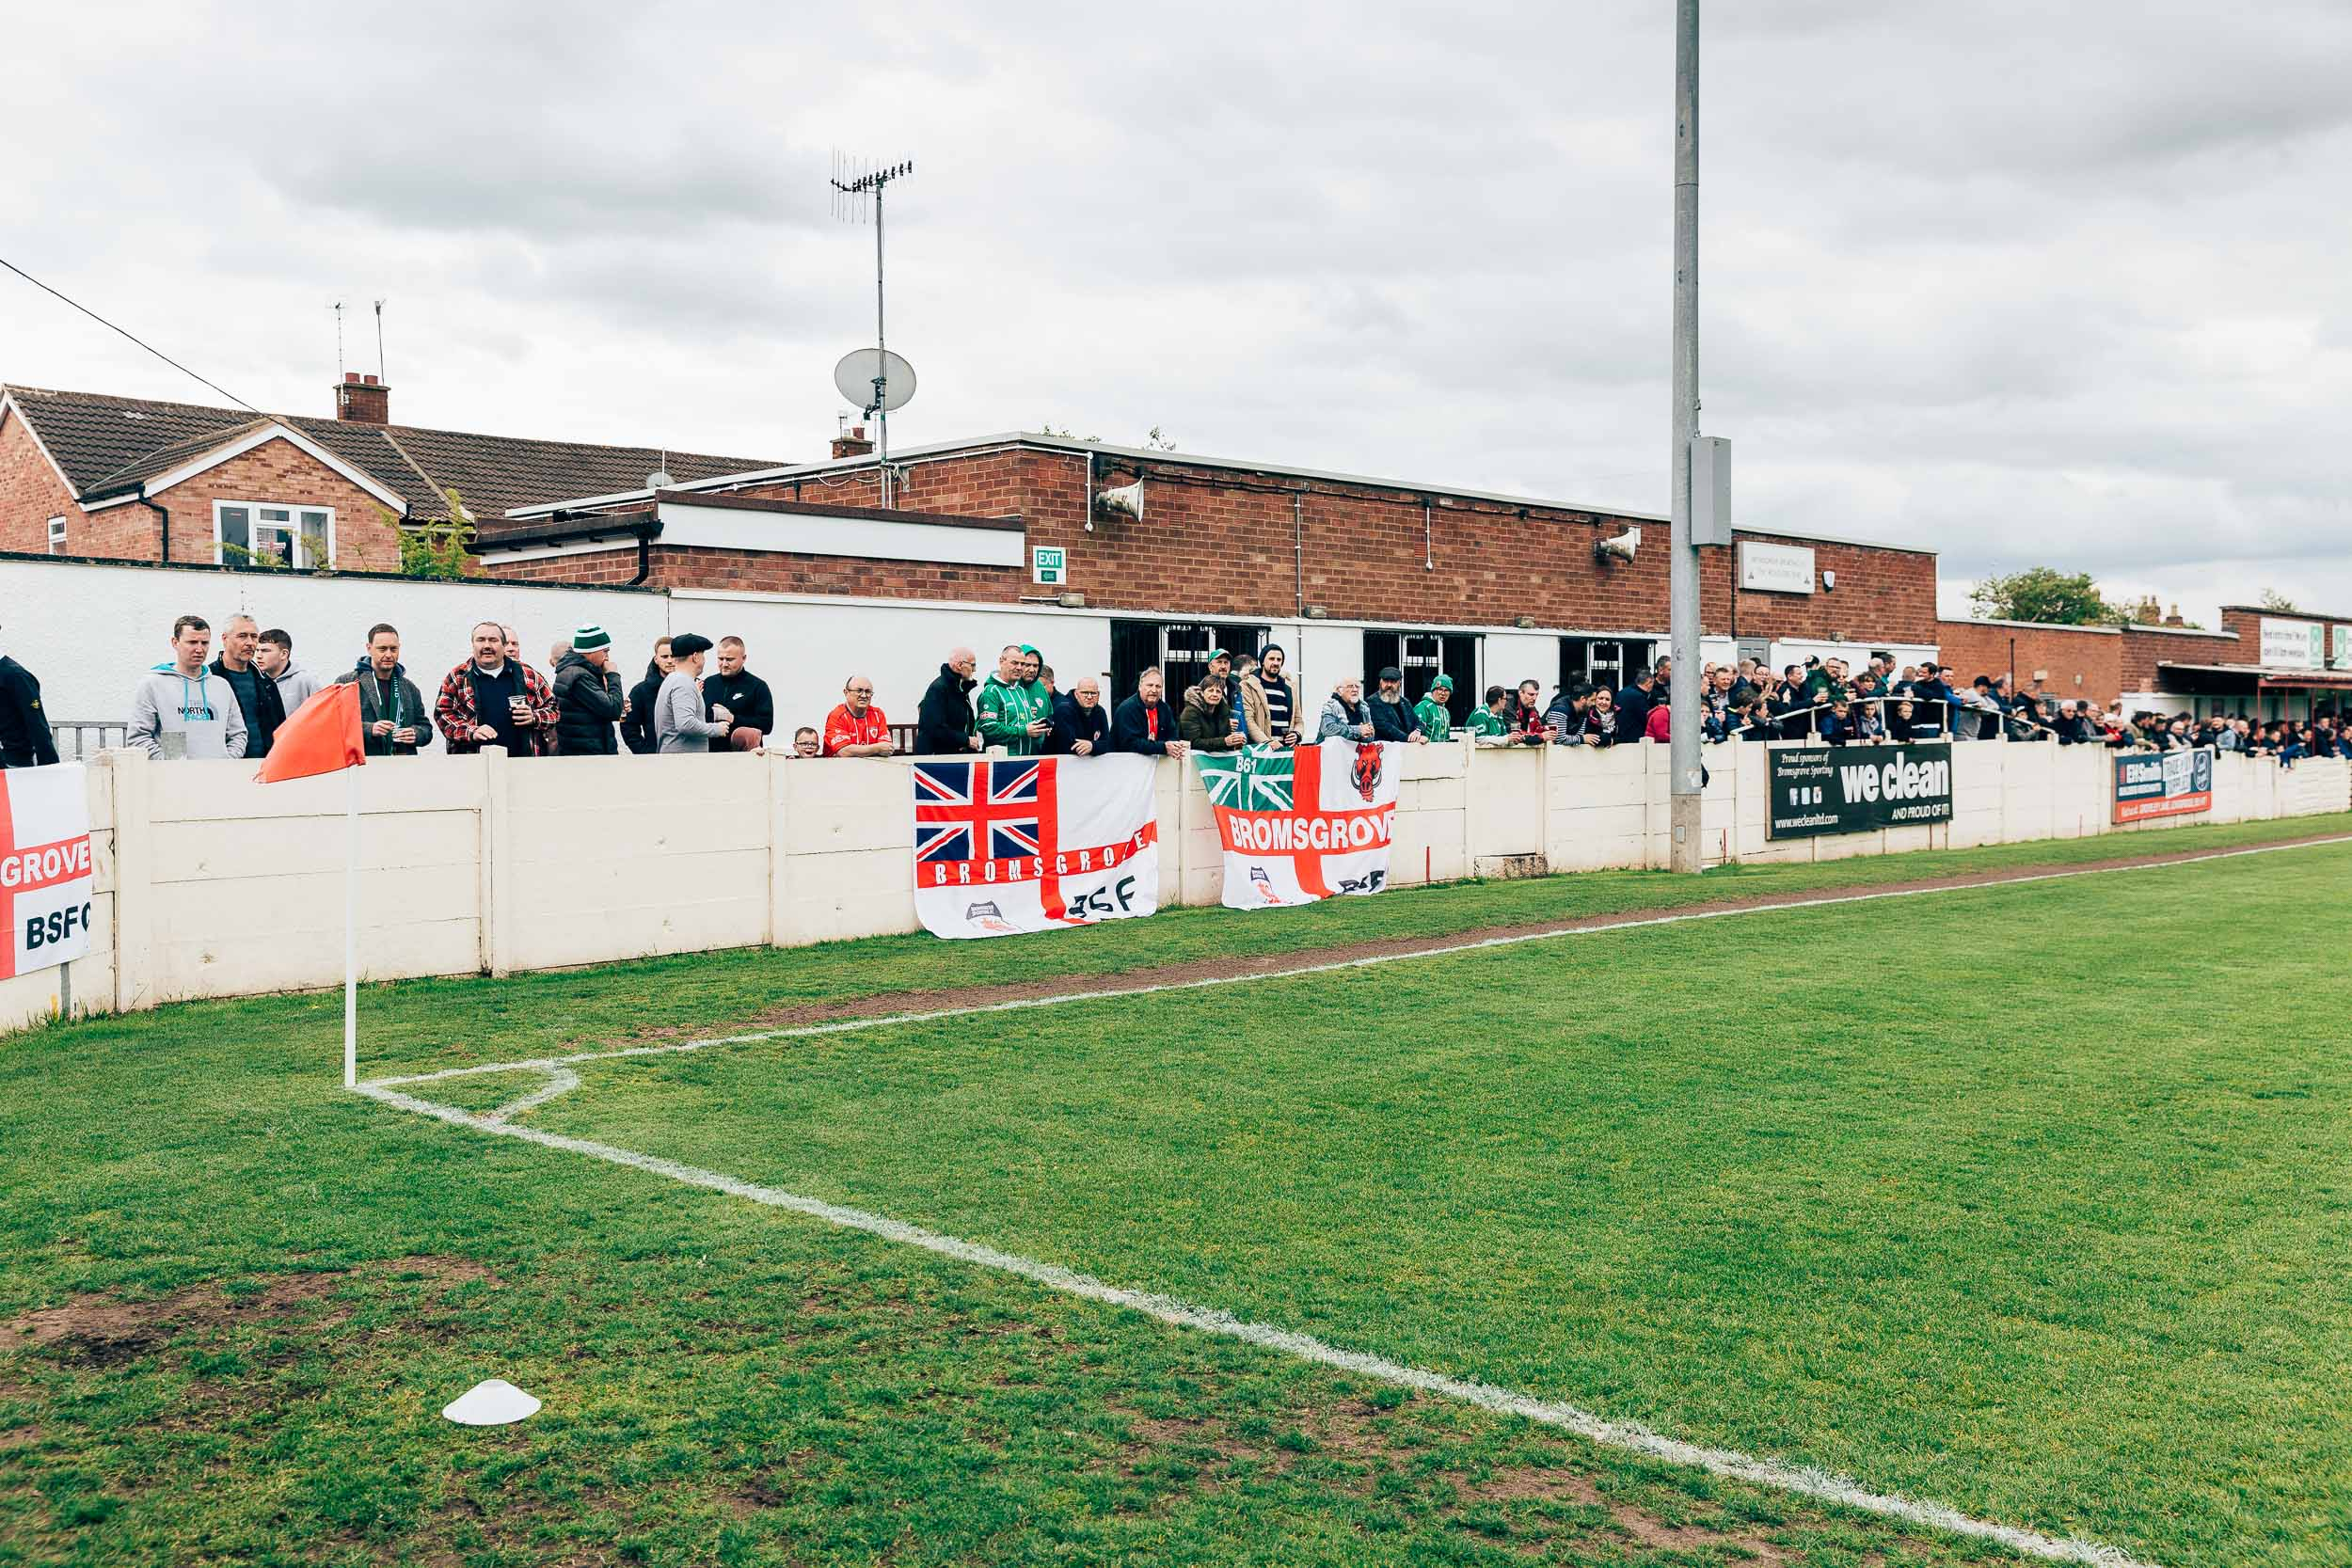 06_05_2019_Bromsgrove_Sporting_Corby-32.jpg